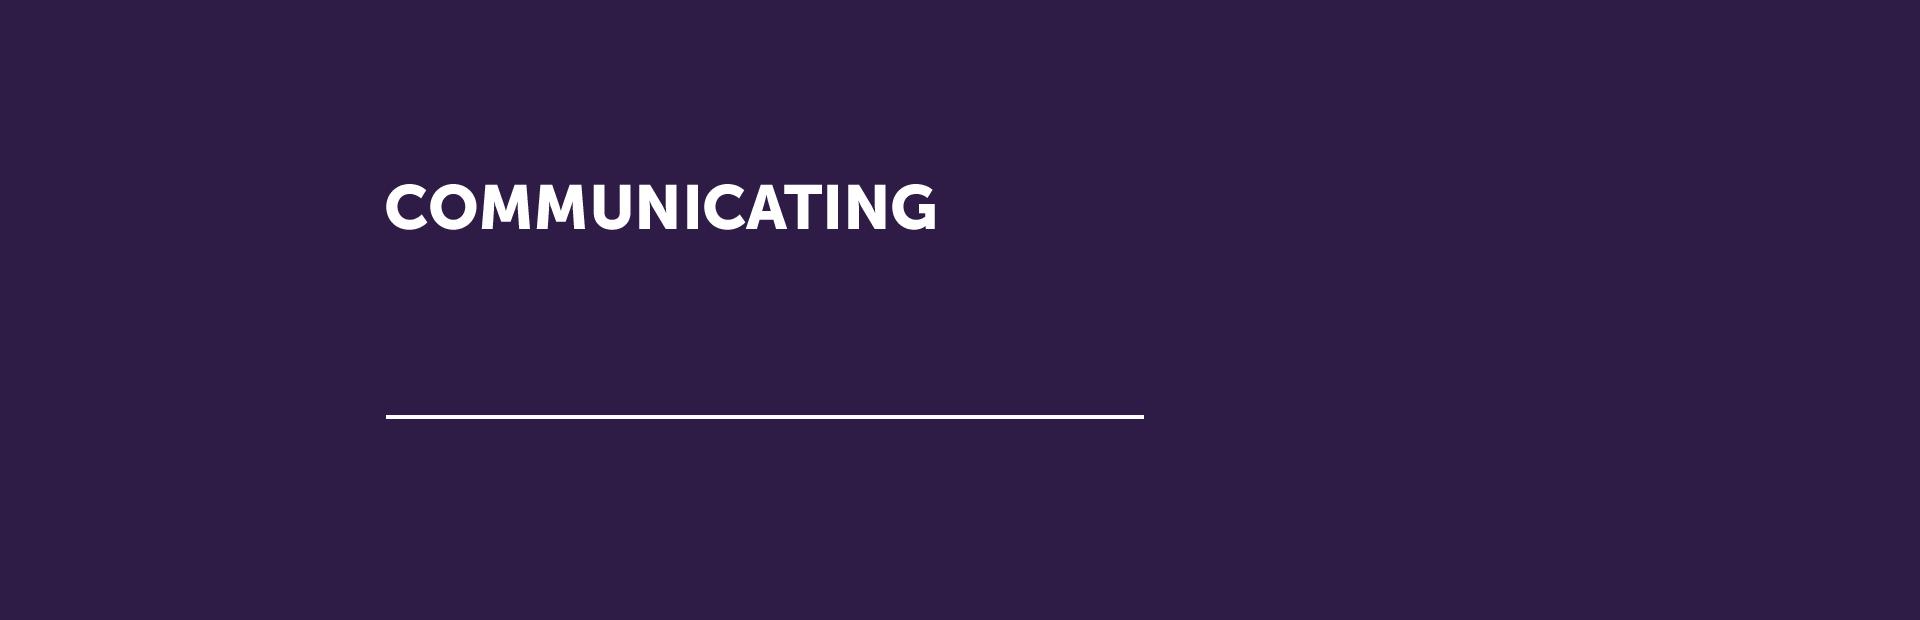 Brands Image